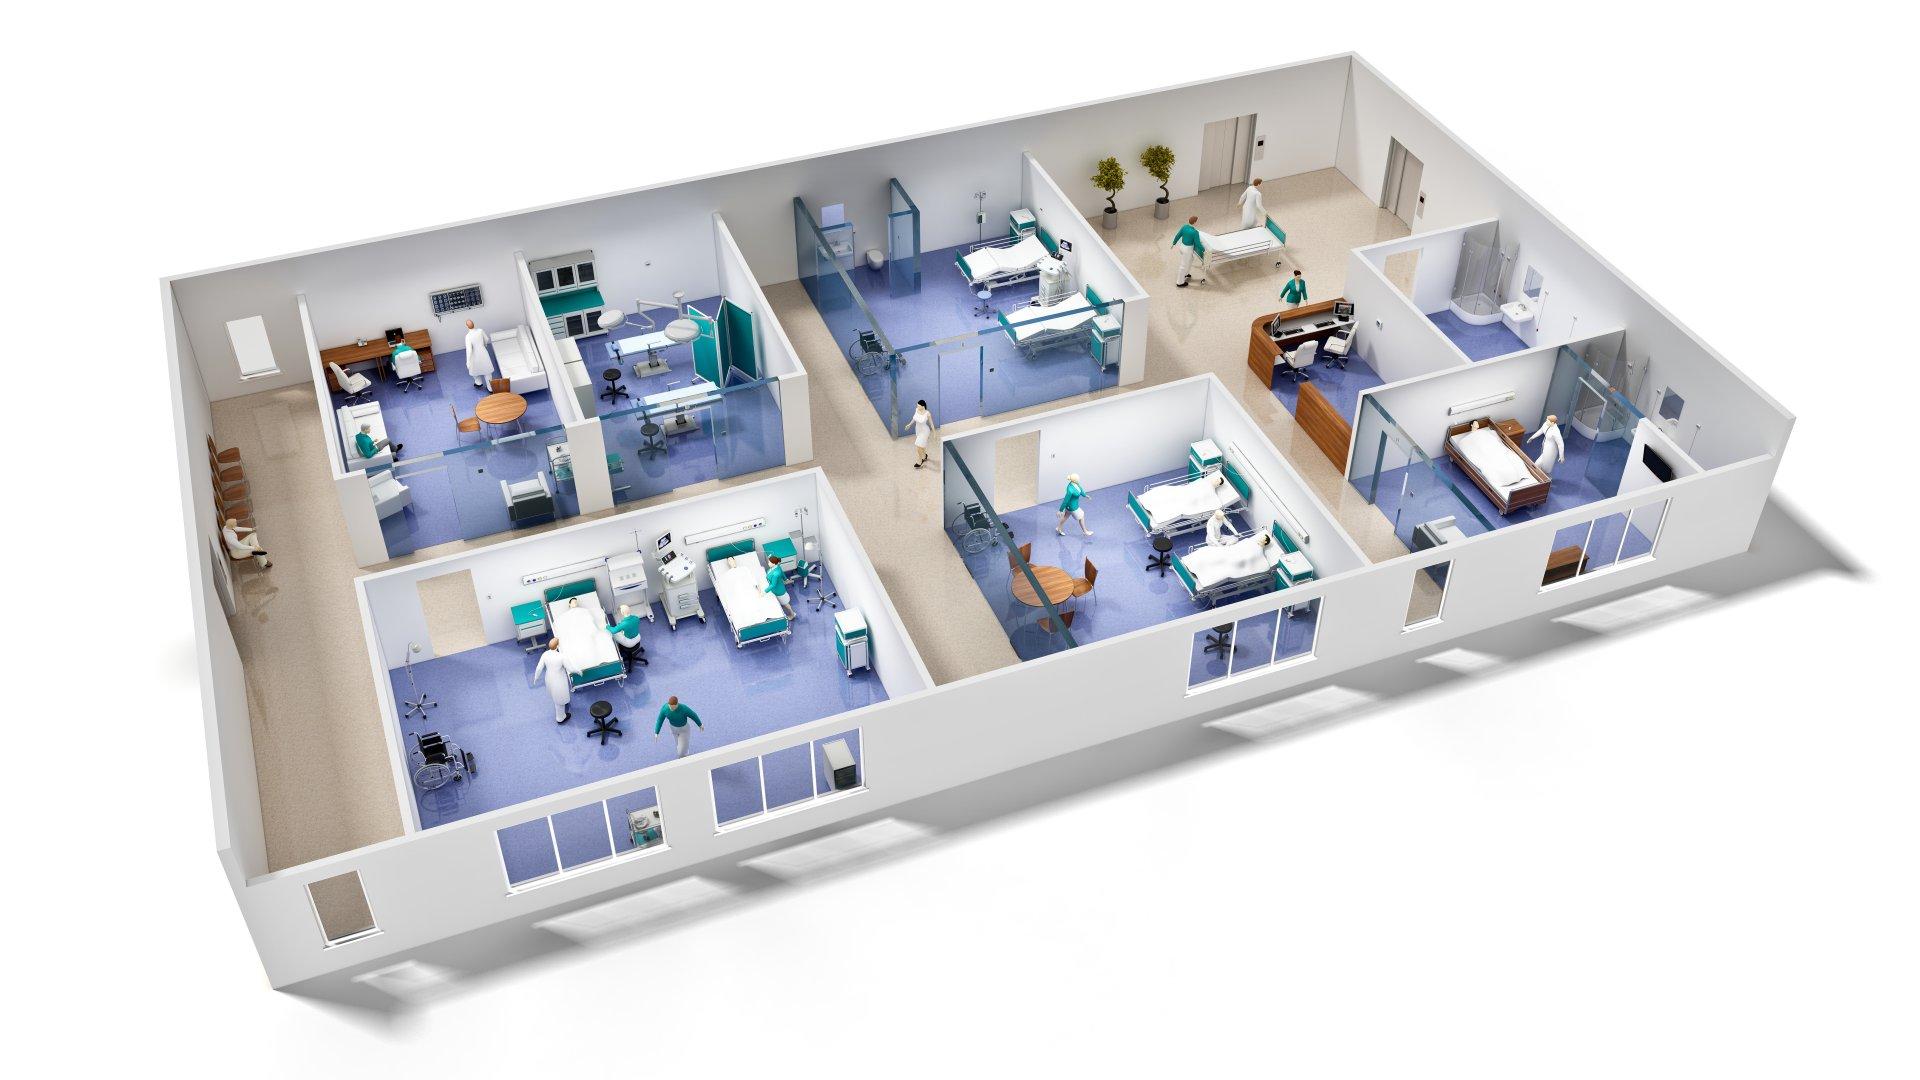 R&D Business Plan